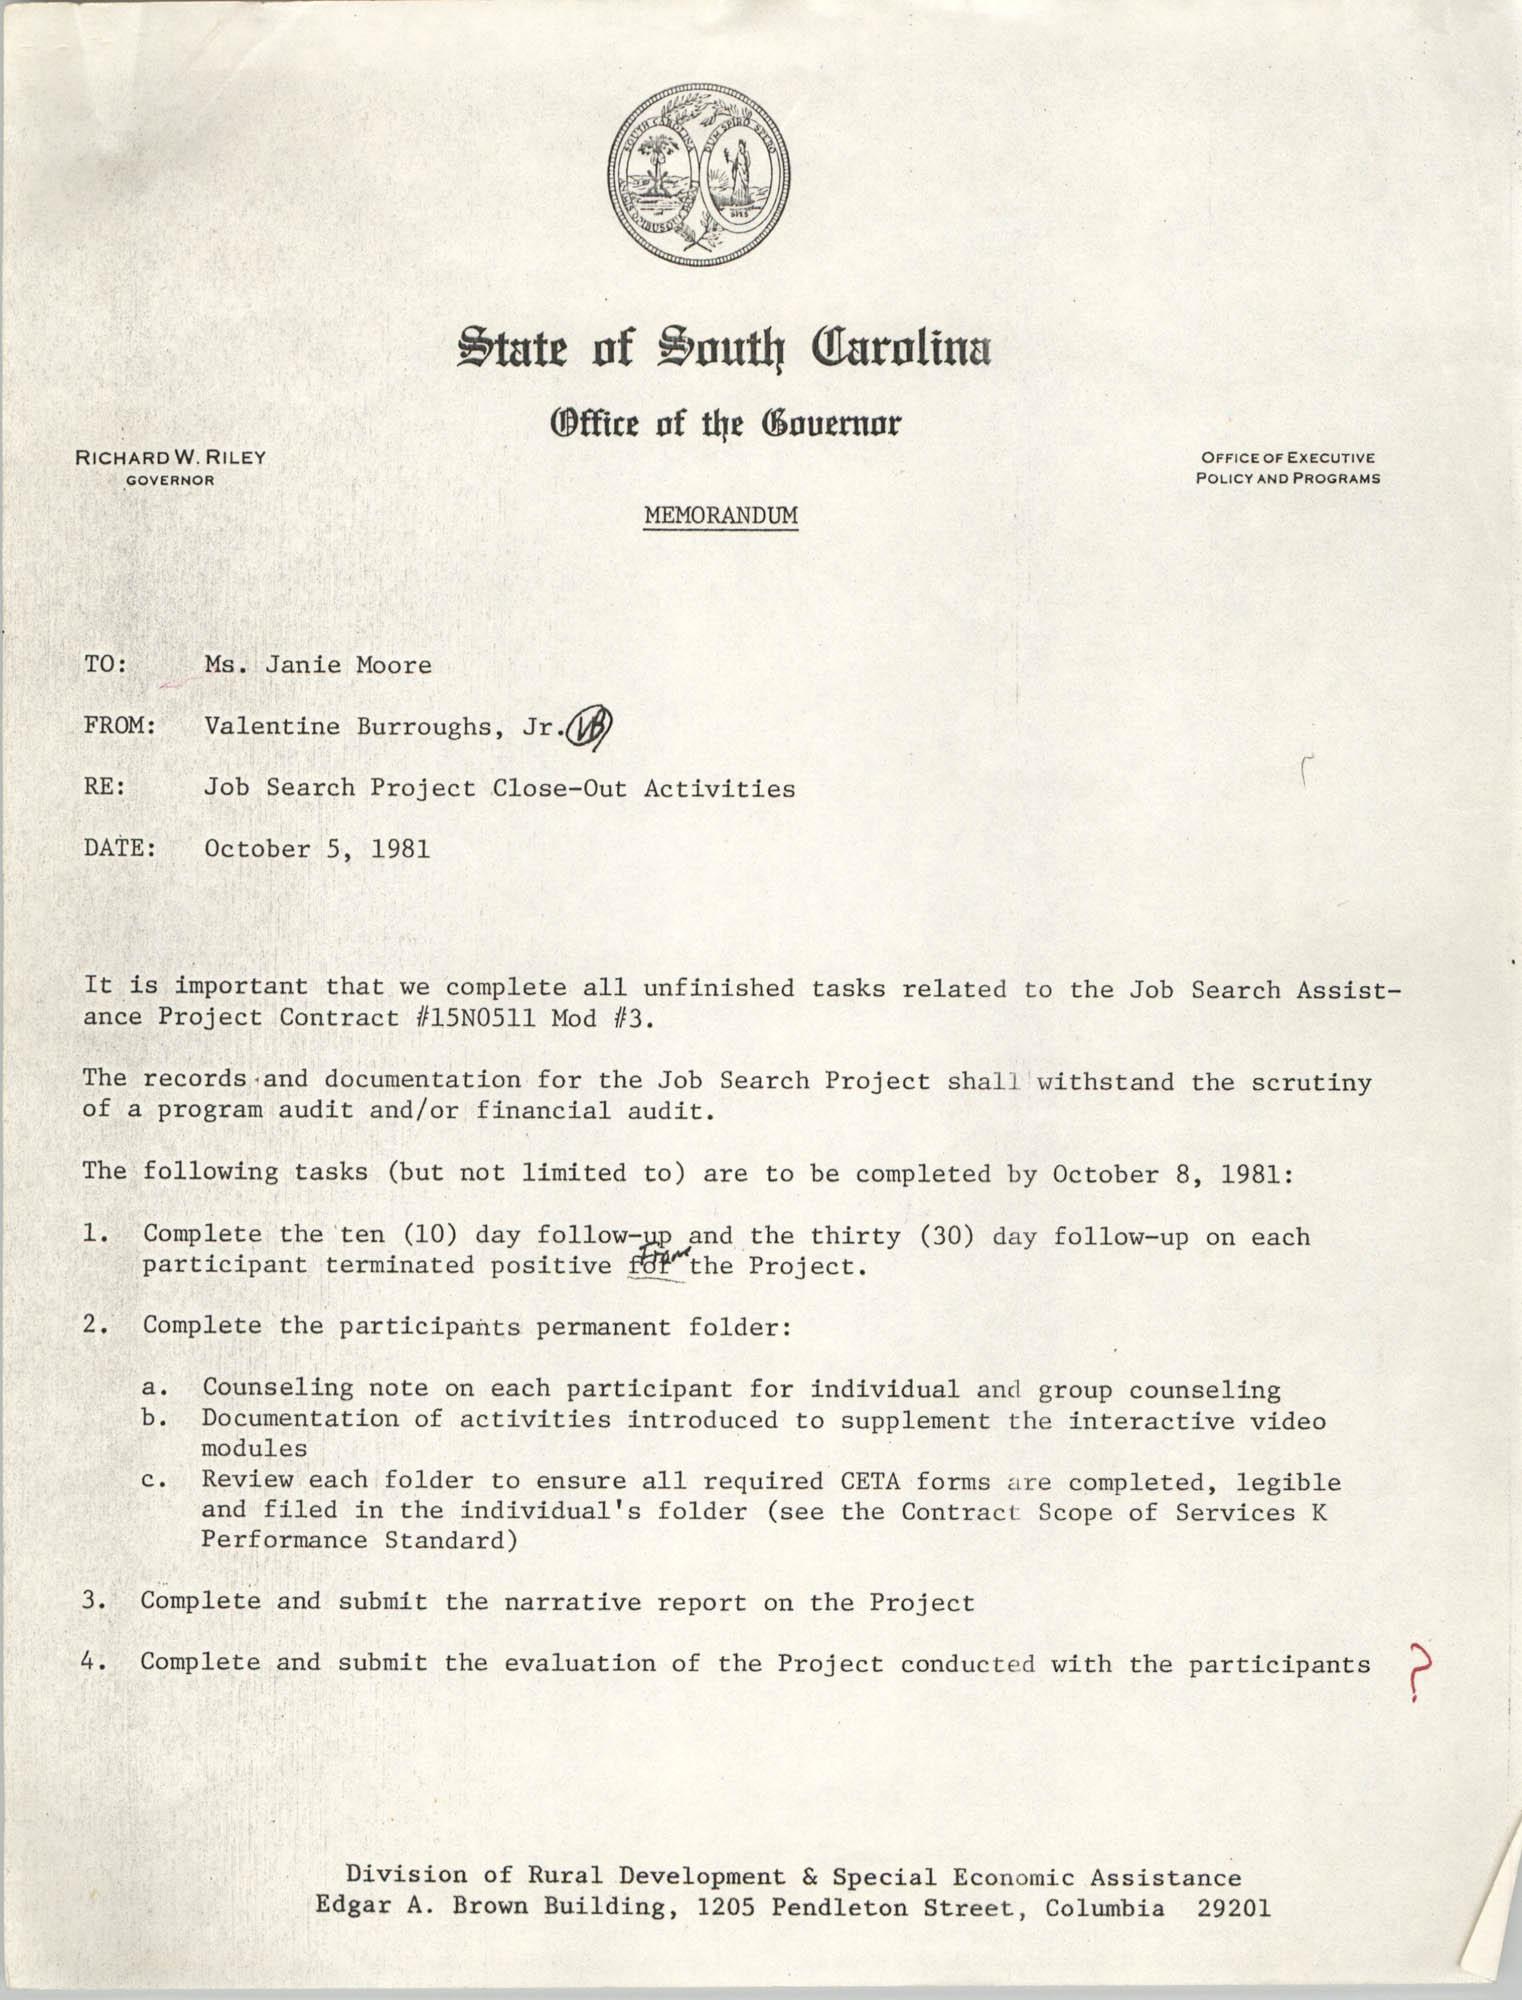 State of South Carolina, Office of the Governor, Memorandum, October 5, 1981